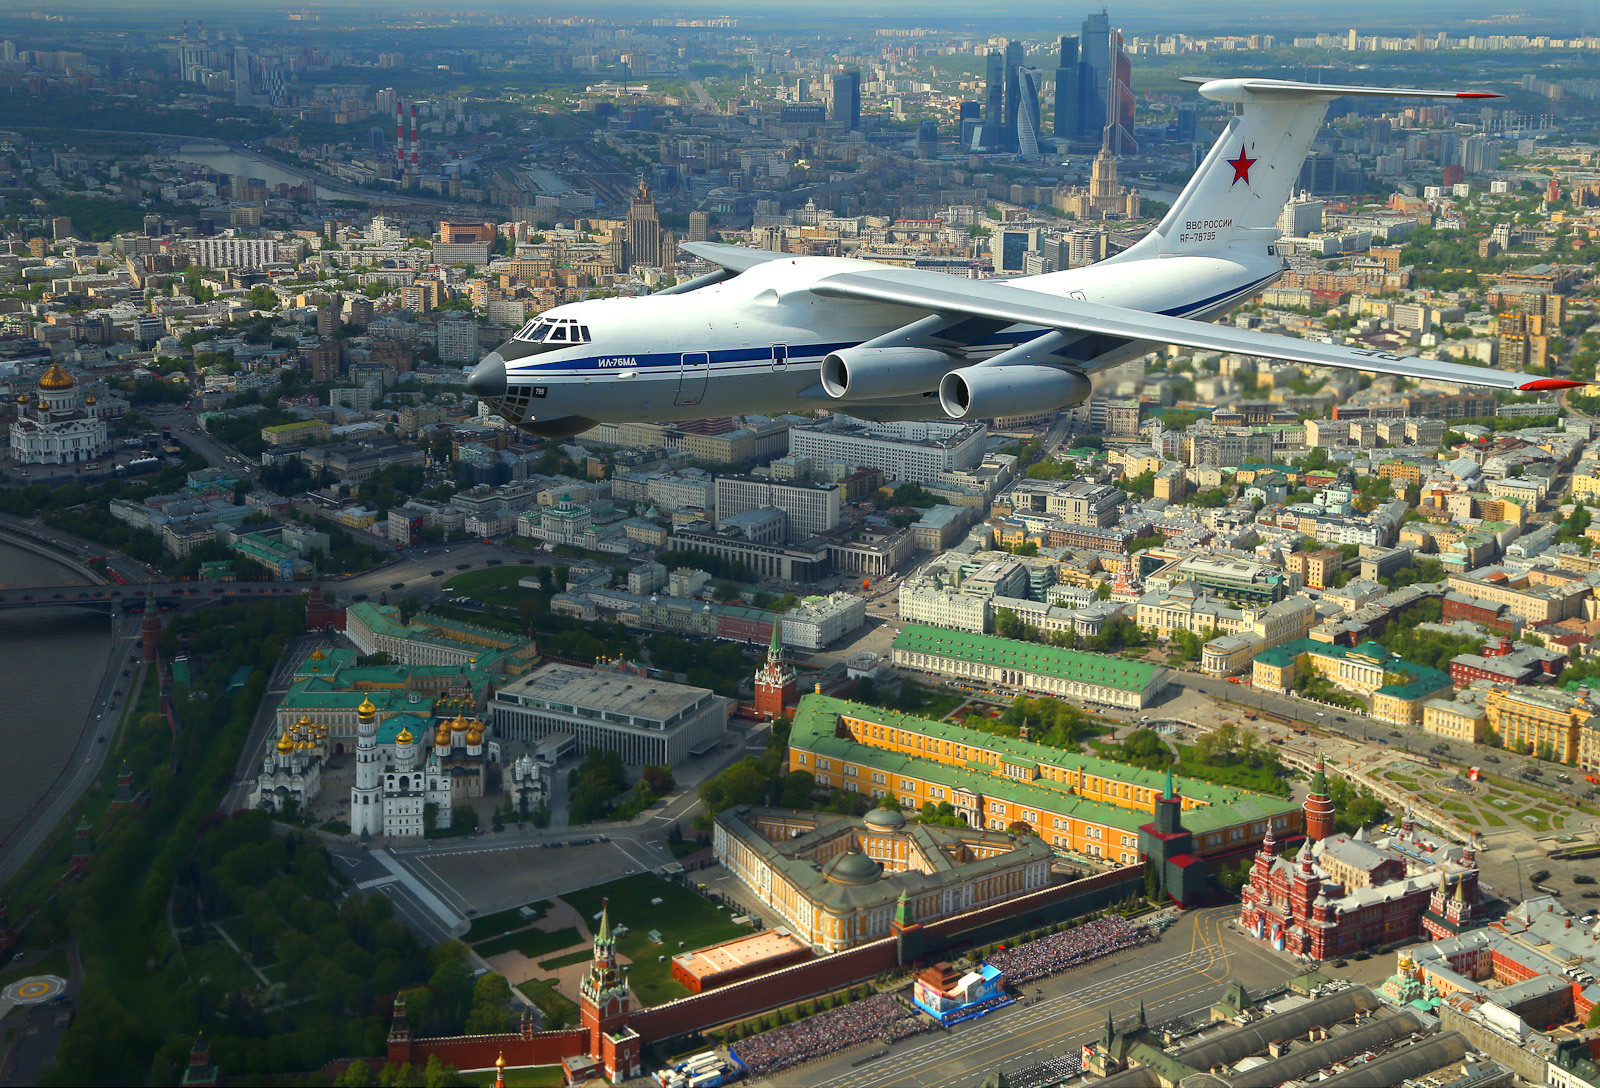 Iljušin Il-76, višenamjenski četveromotorni strateški zrakoplov, iznad Kremlja.